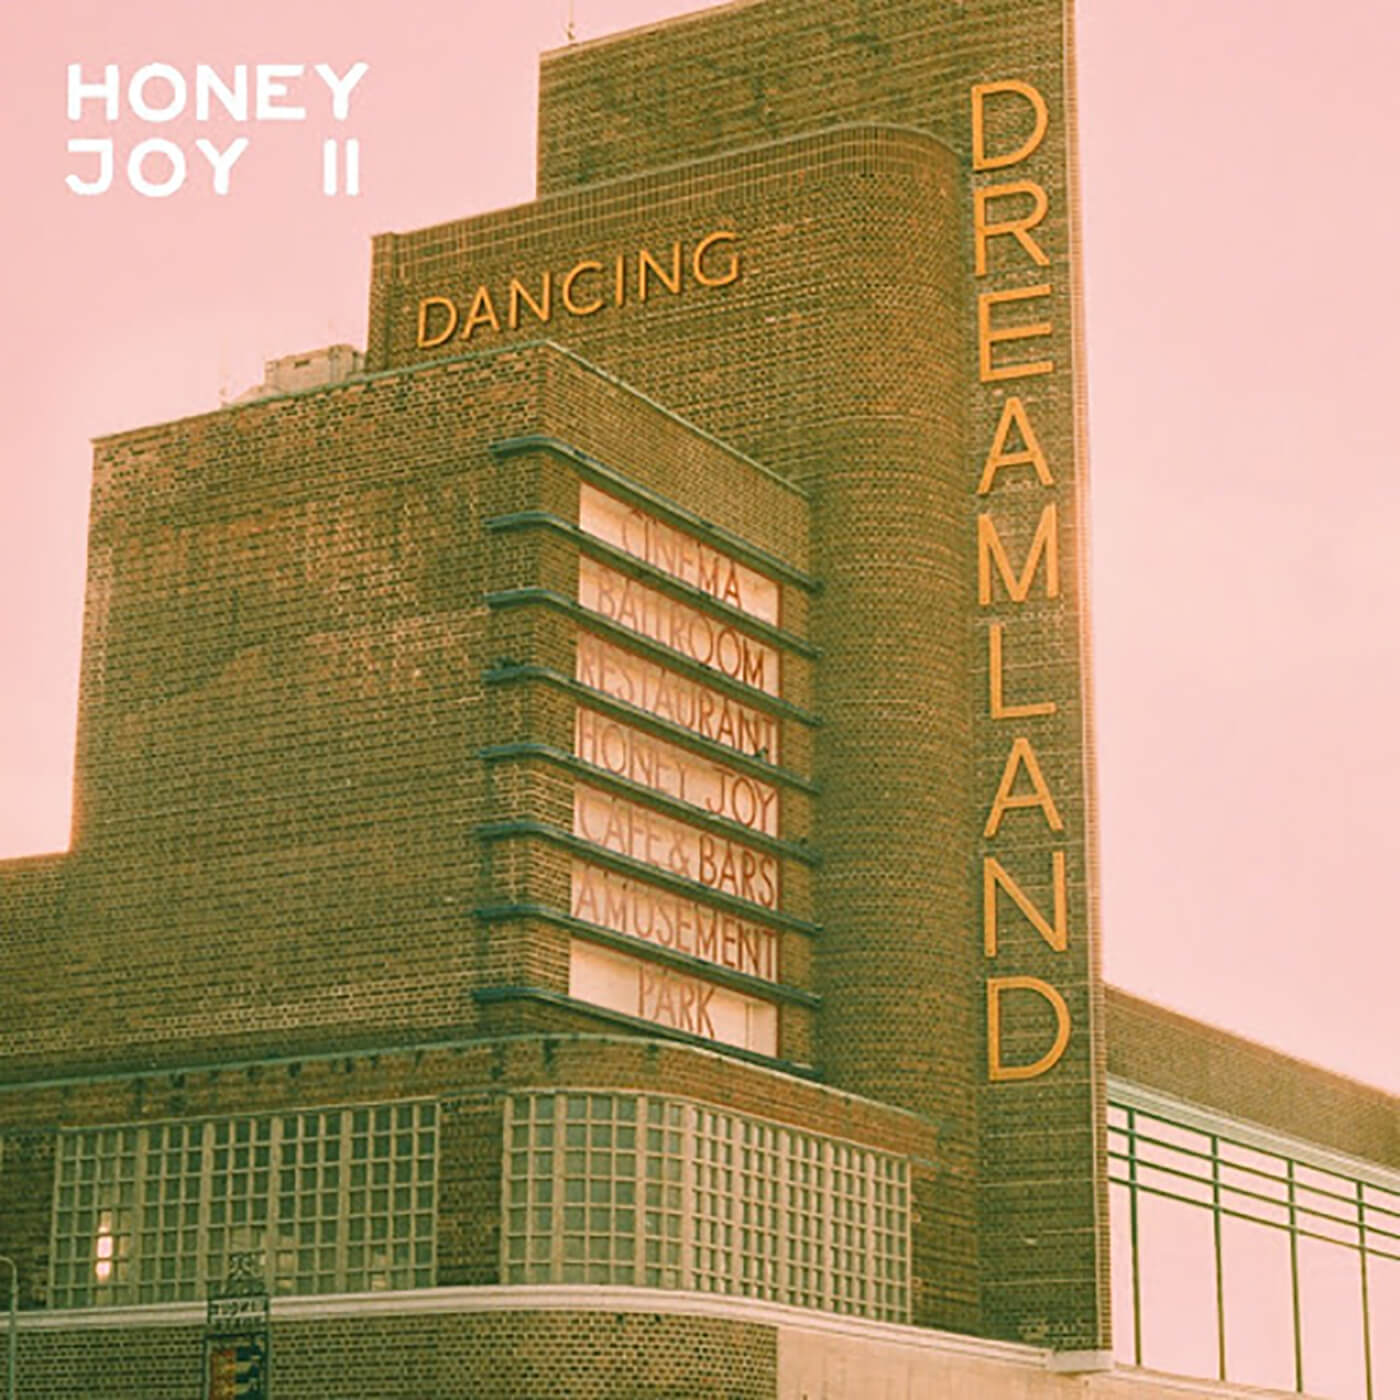 Honey Joy - II